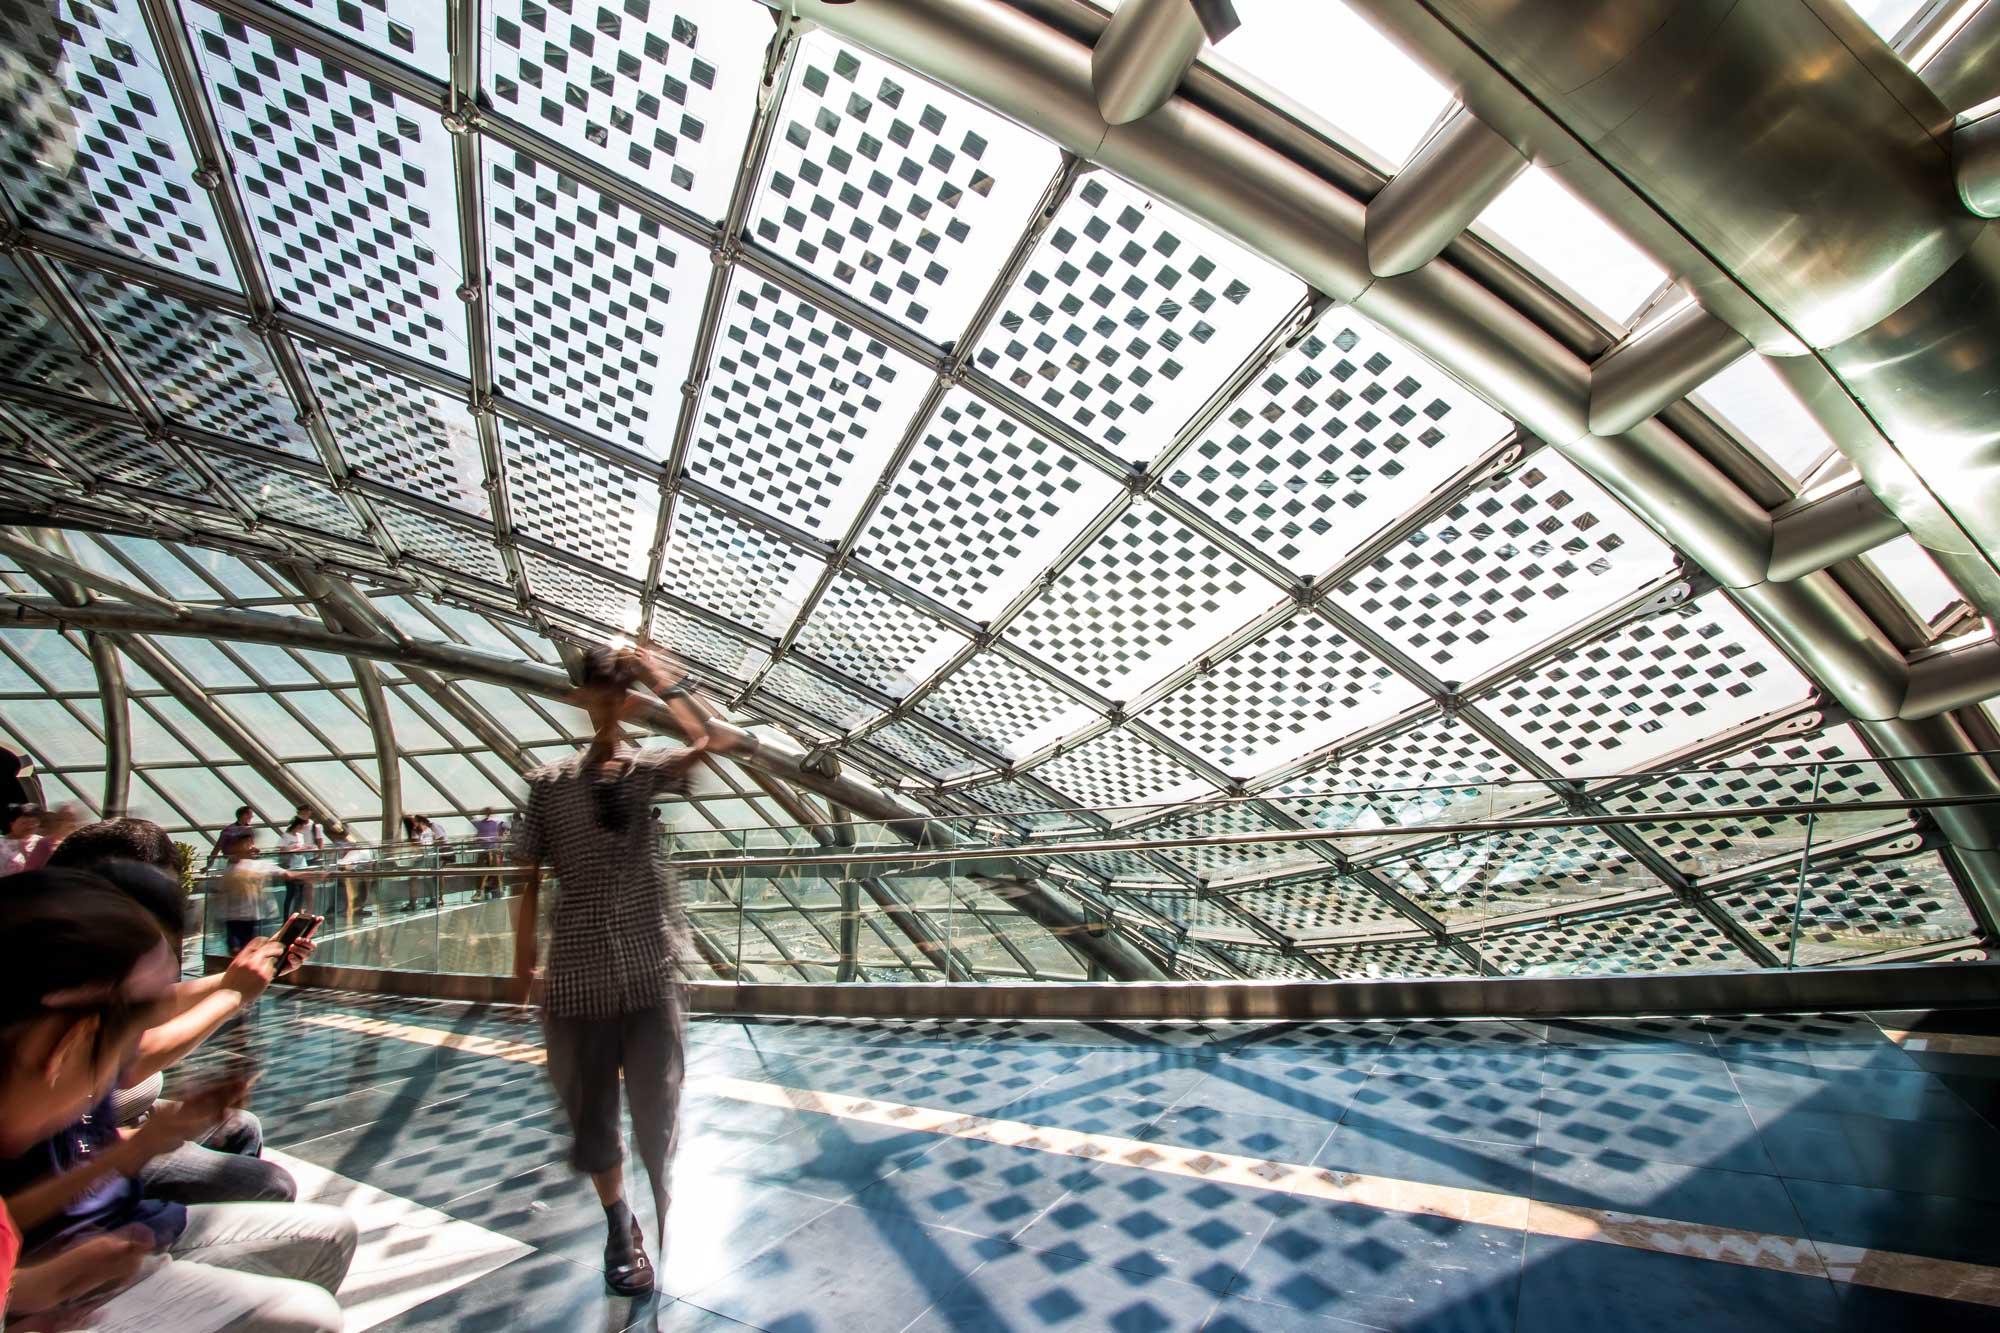 Sphere Expo2017, Foto: ertex solar/Dieter Moor